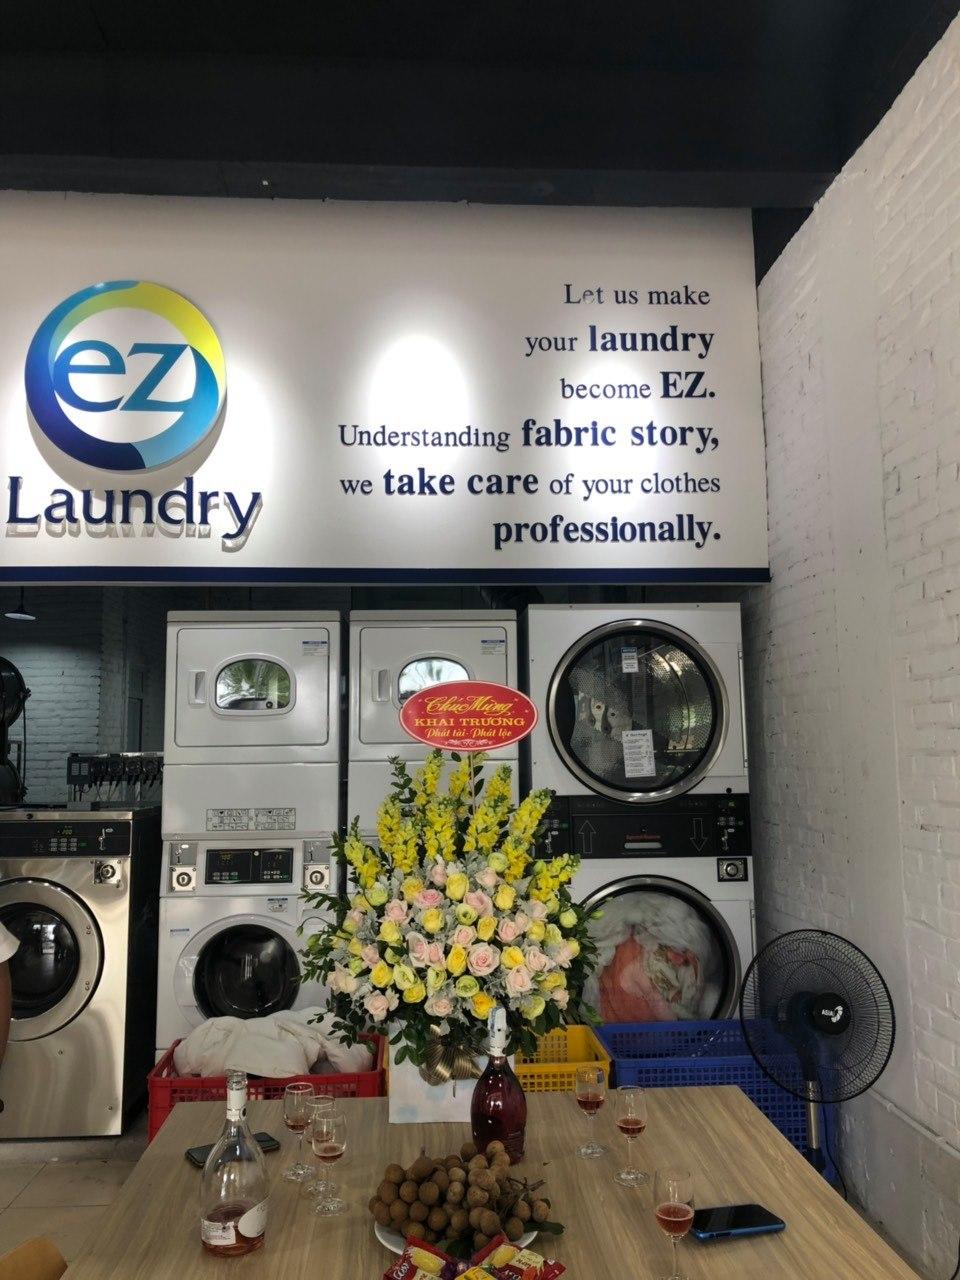 Máy giặt sấy xếp chồng